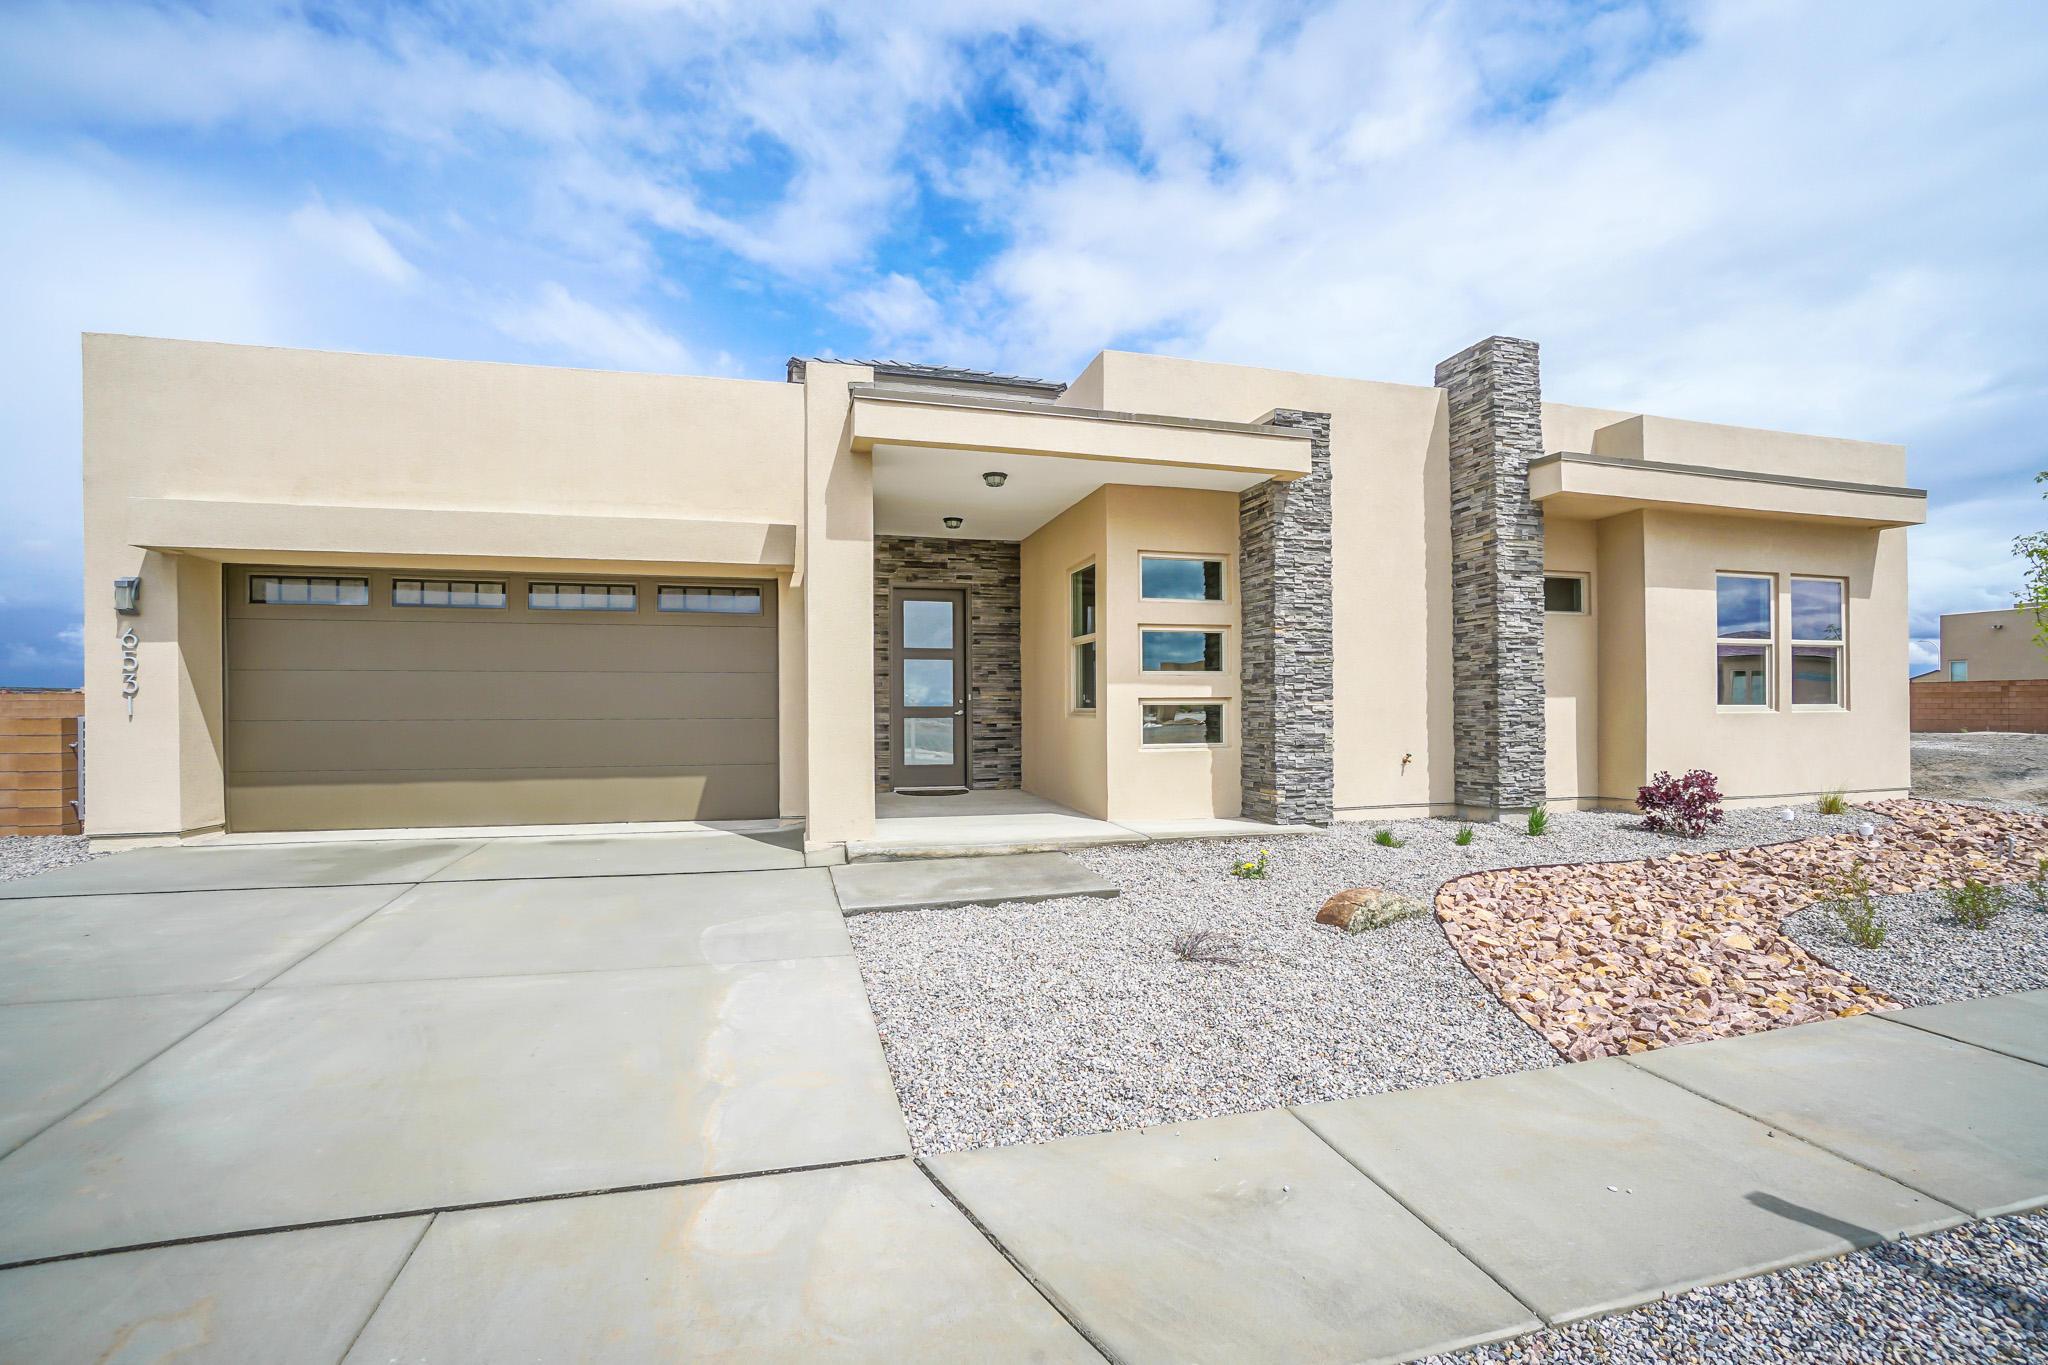 7907 NW Tiburon Hills Drive, Northwest Albuquerque and Northwest Heights, New Mexico